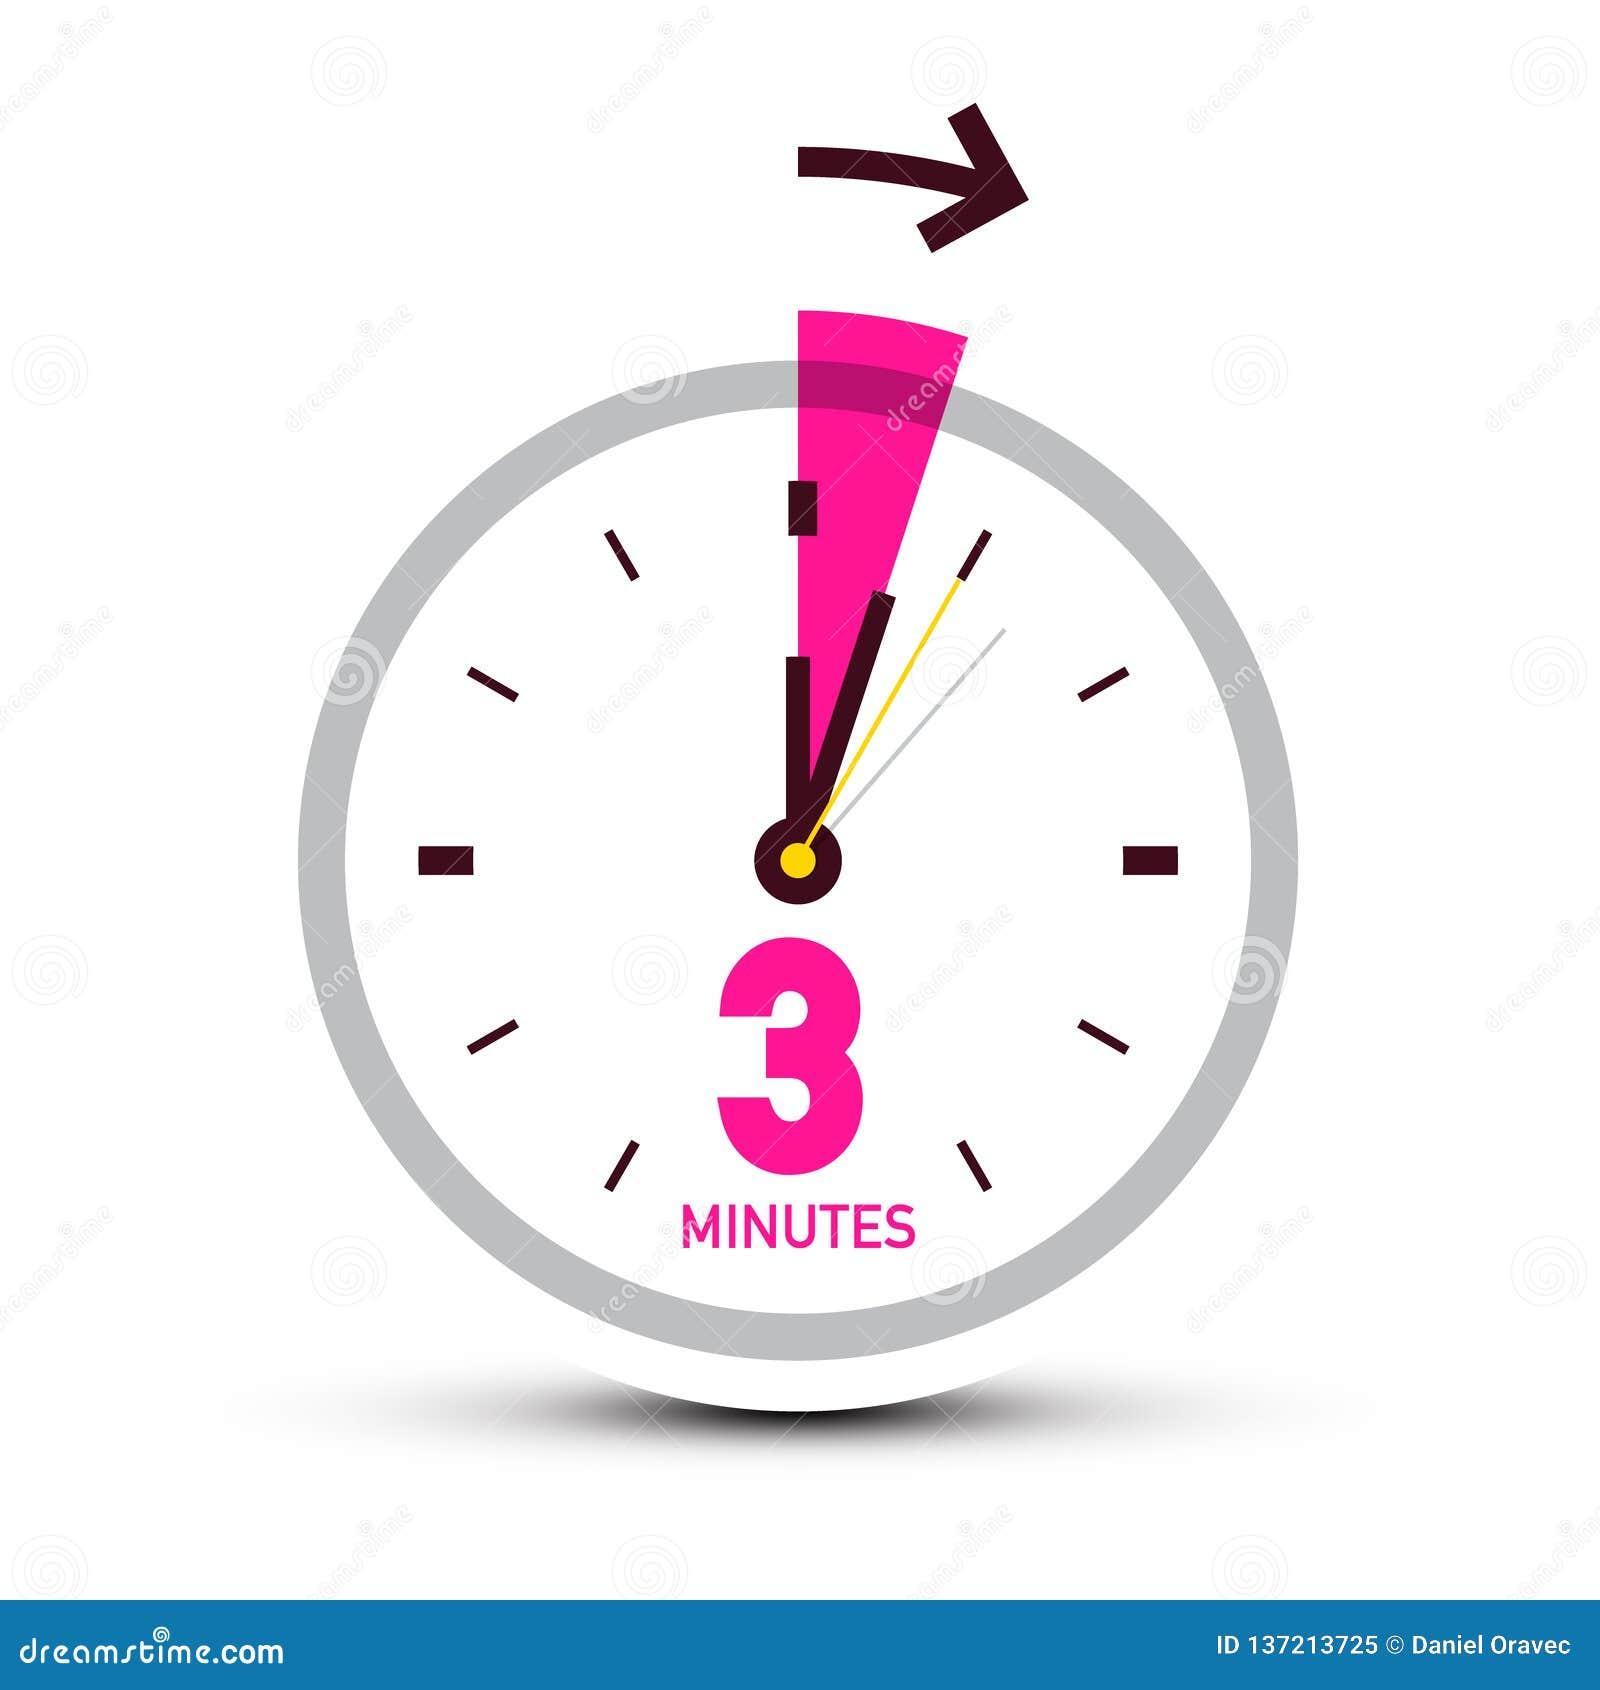 three 3 minutes clock icon with arrow stock vector